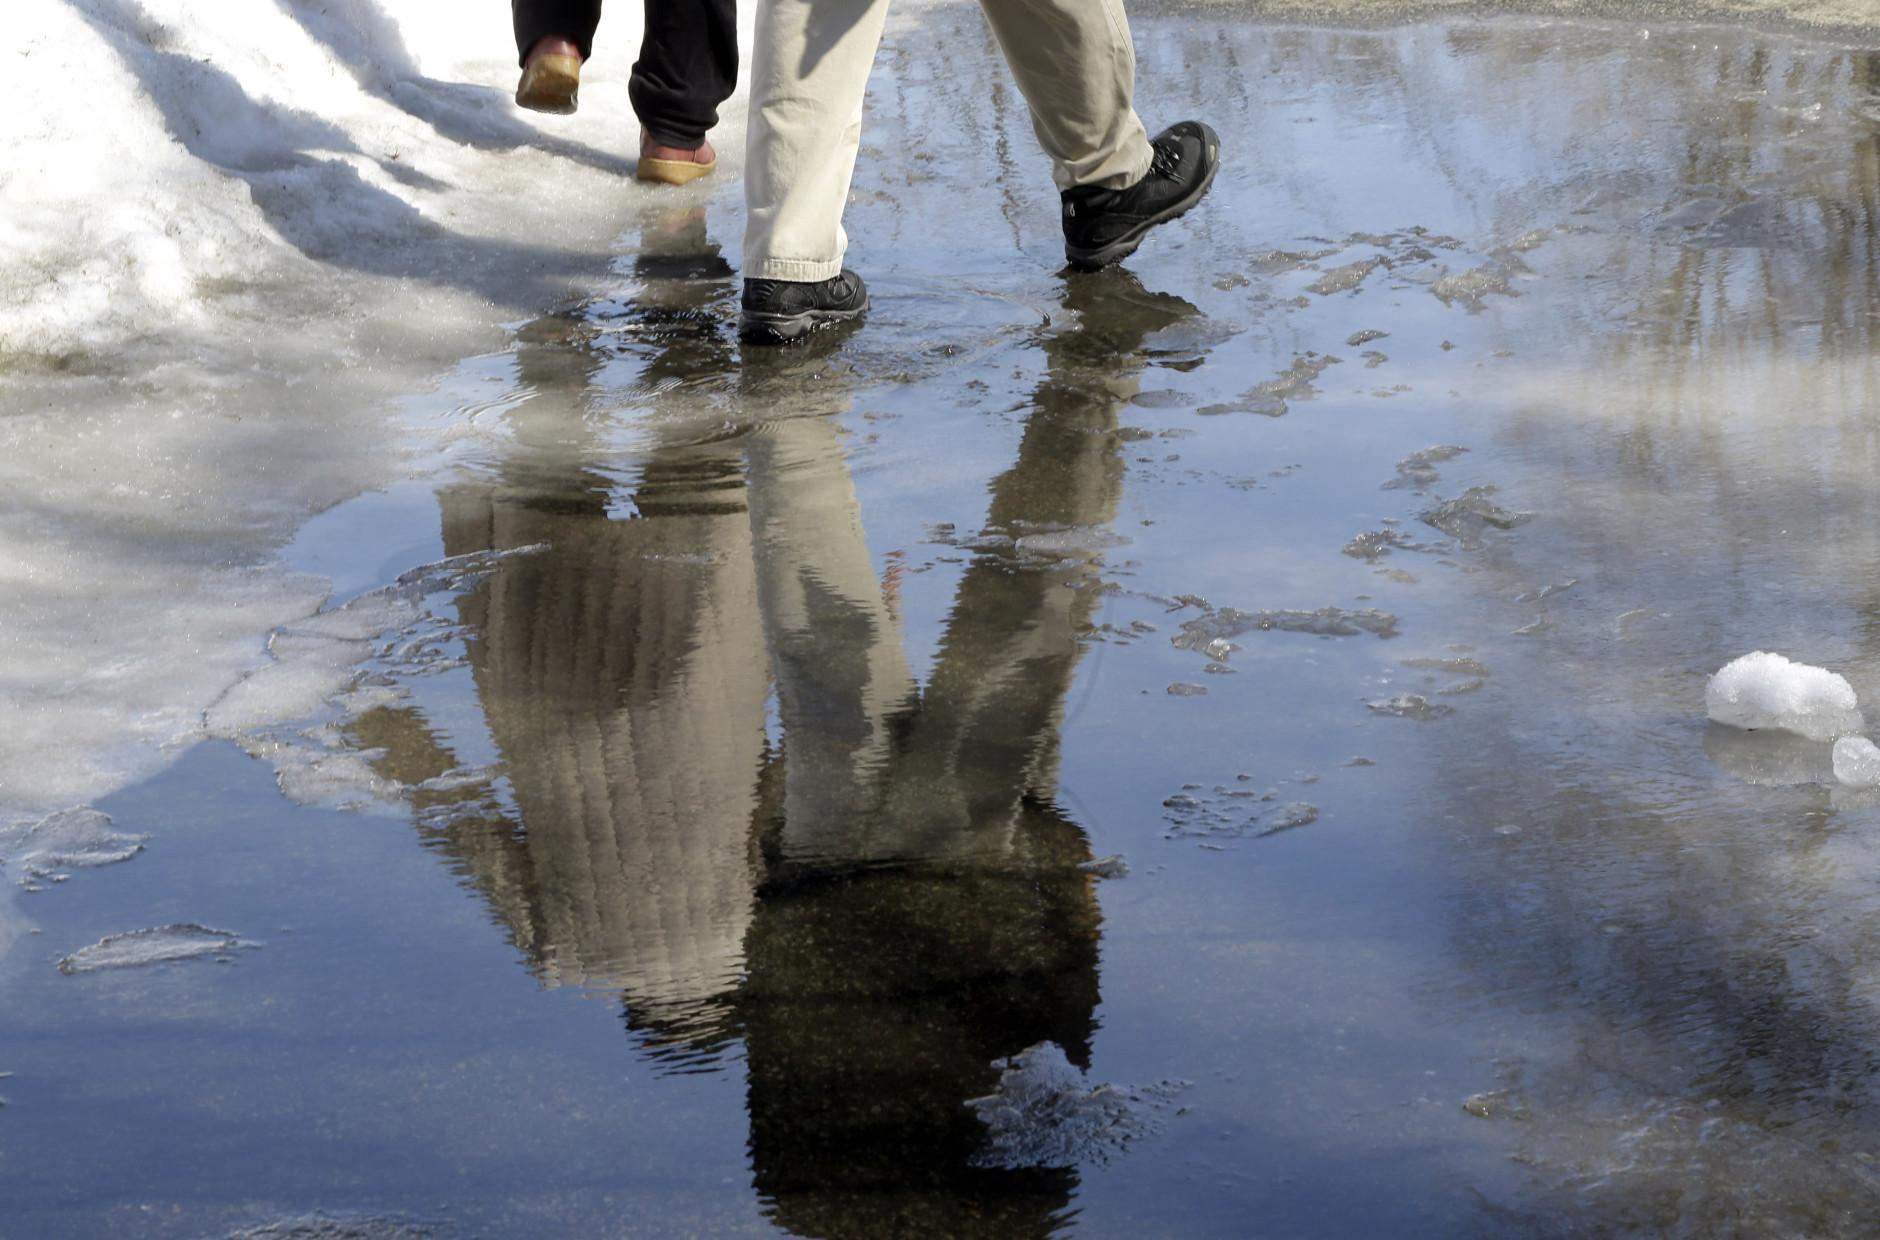 Warm-up, rain may lead to minor flooding